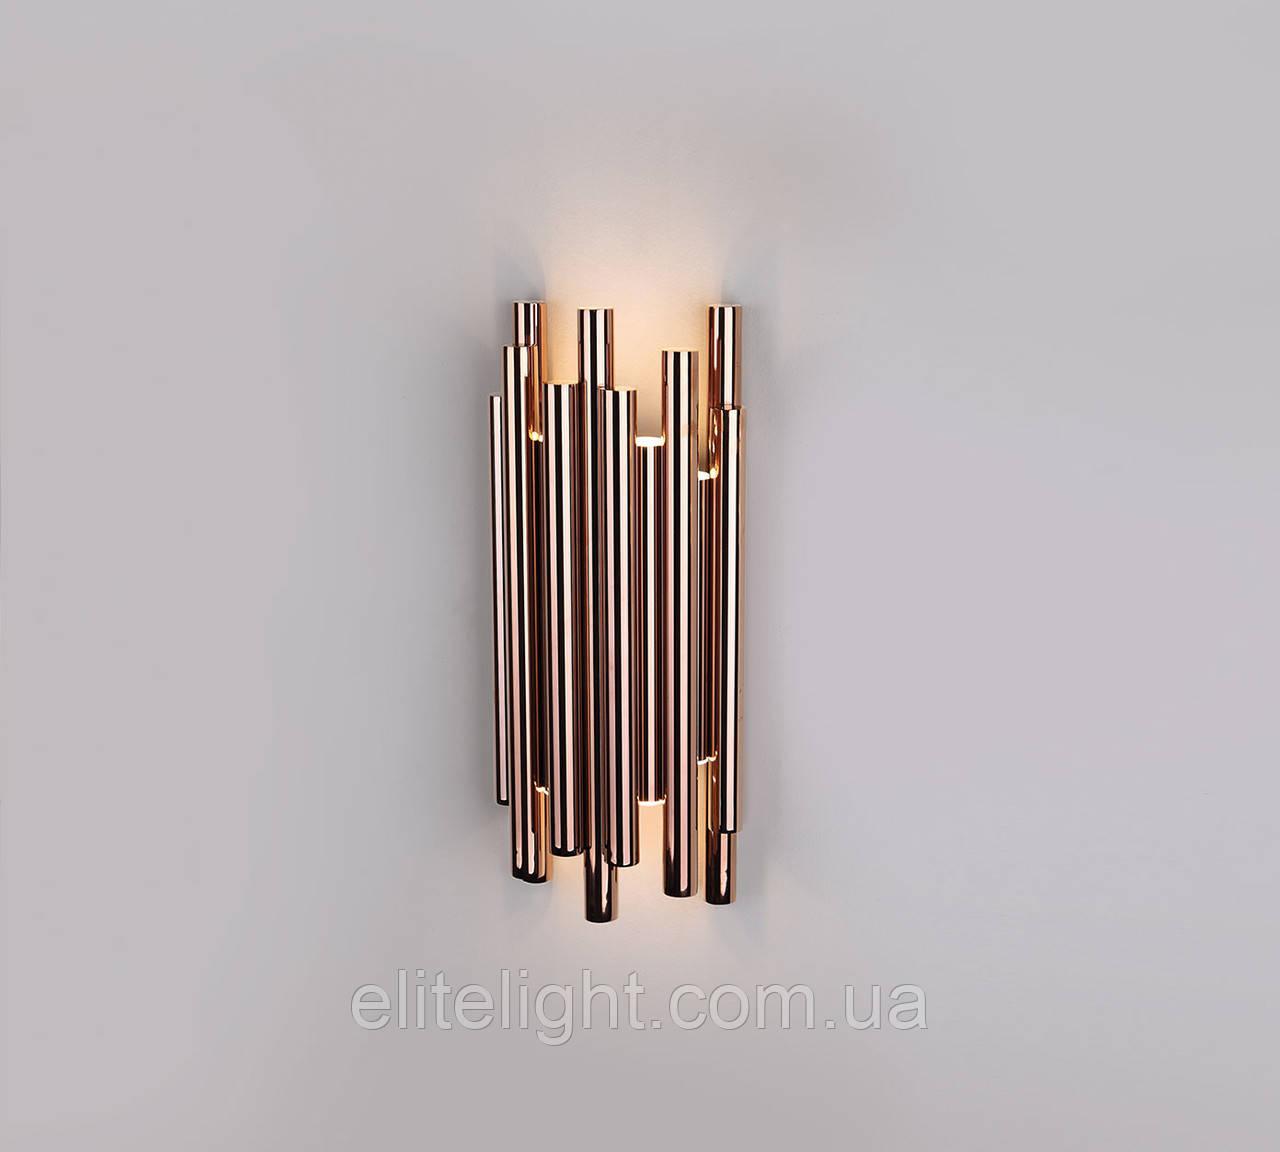 Бра Maxlight Organic Copper W0153